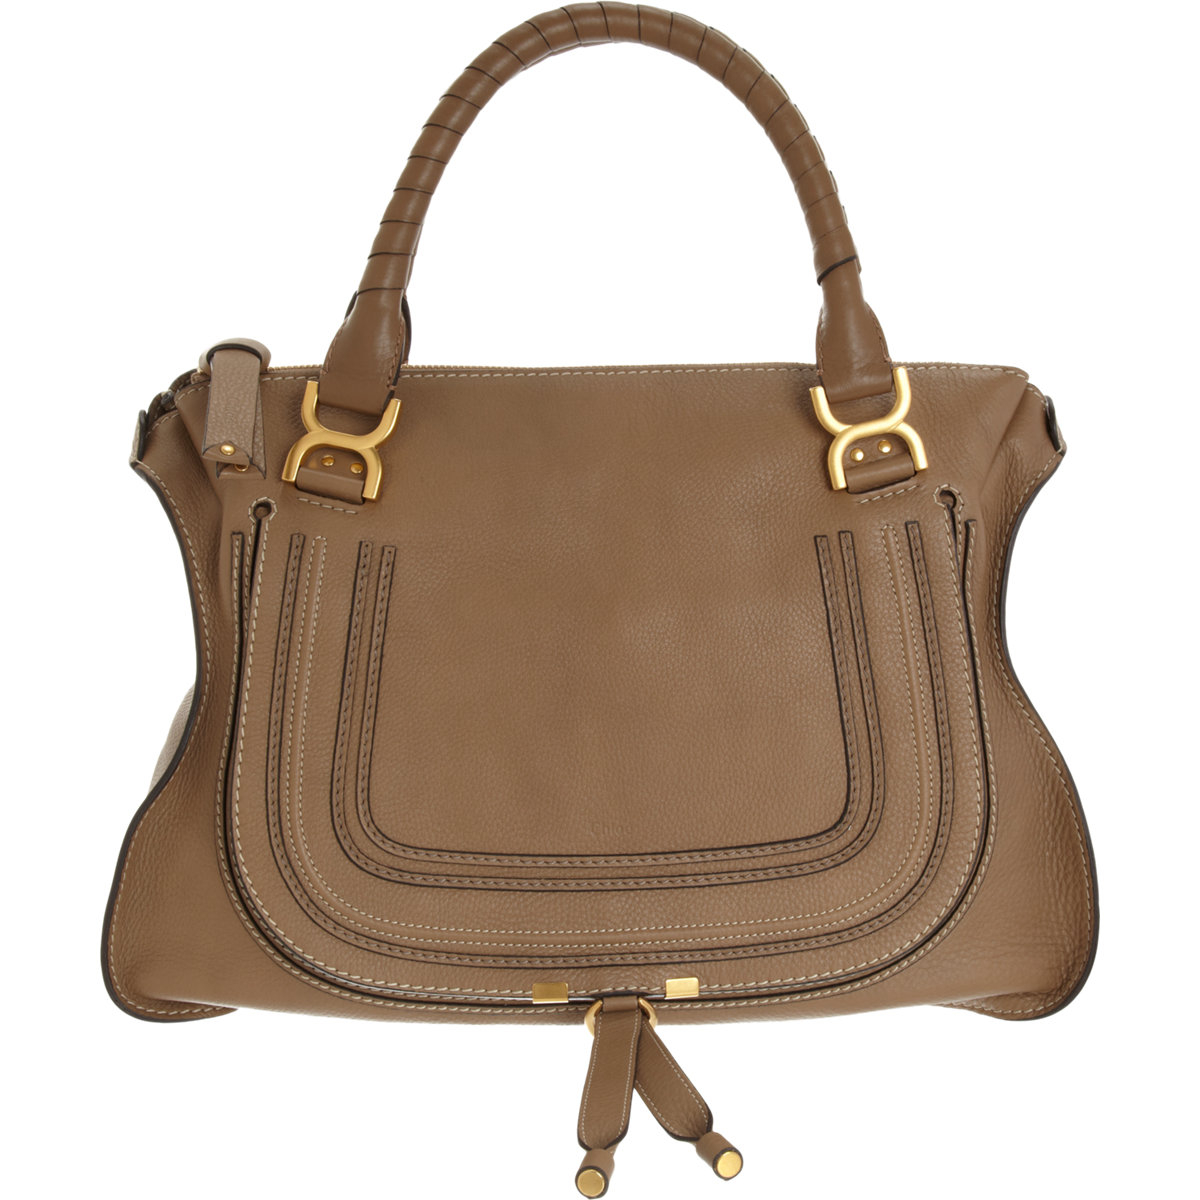 chlo marcie large leather satchel in brown lyst. Black Bedroom Furniture Sets. Home Design Ideas